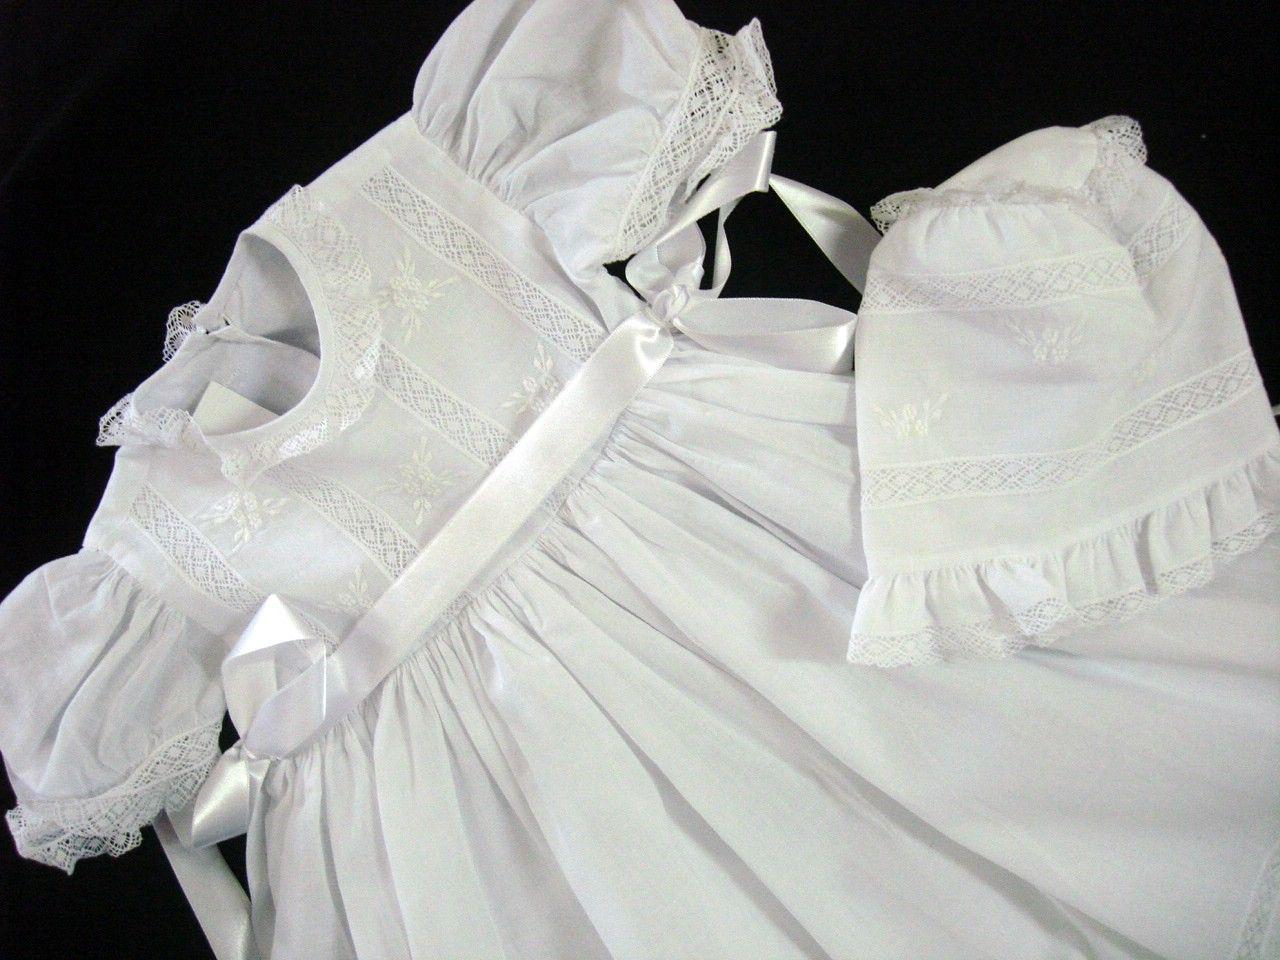 Mandriao Camisola Batizado Laura